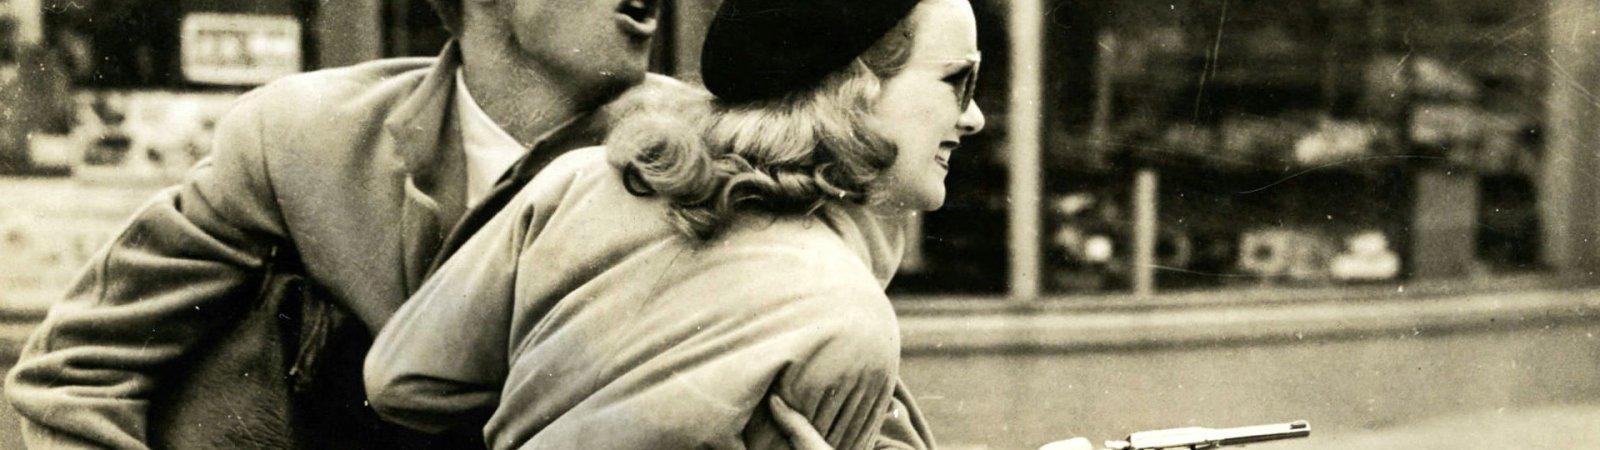 Photo dernier film Berry Kroeger